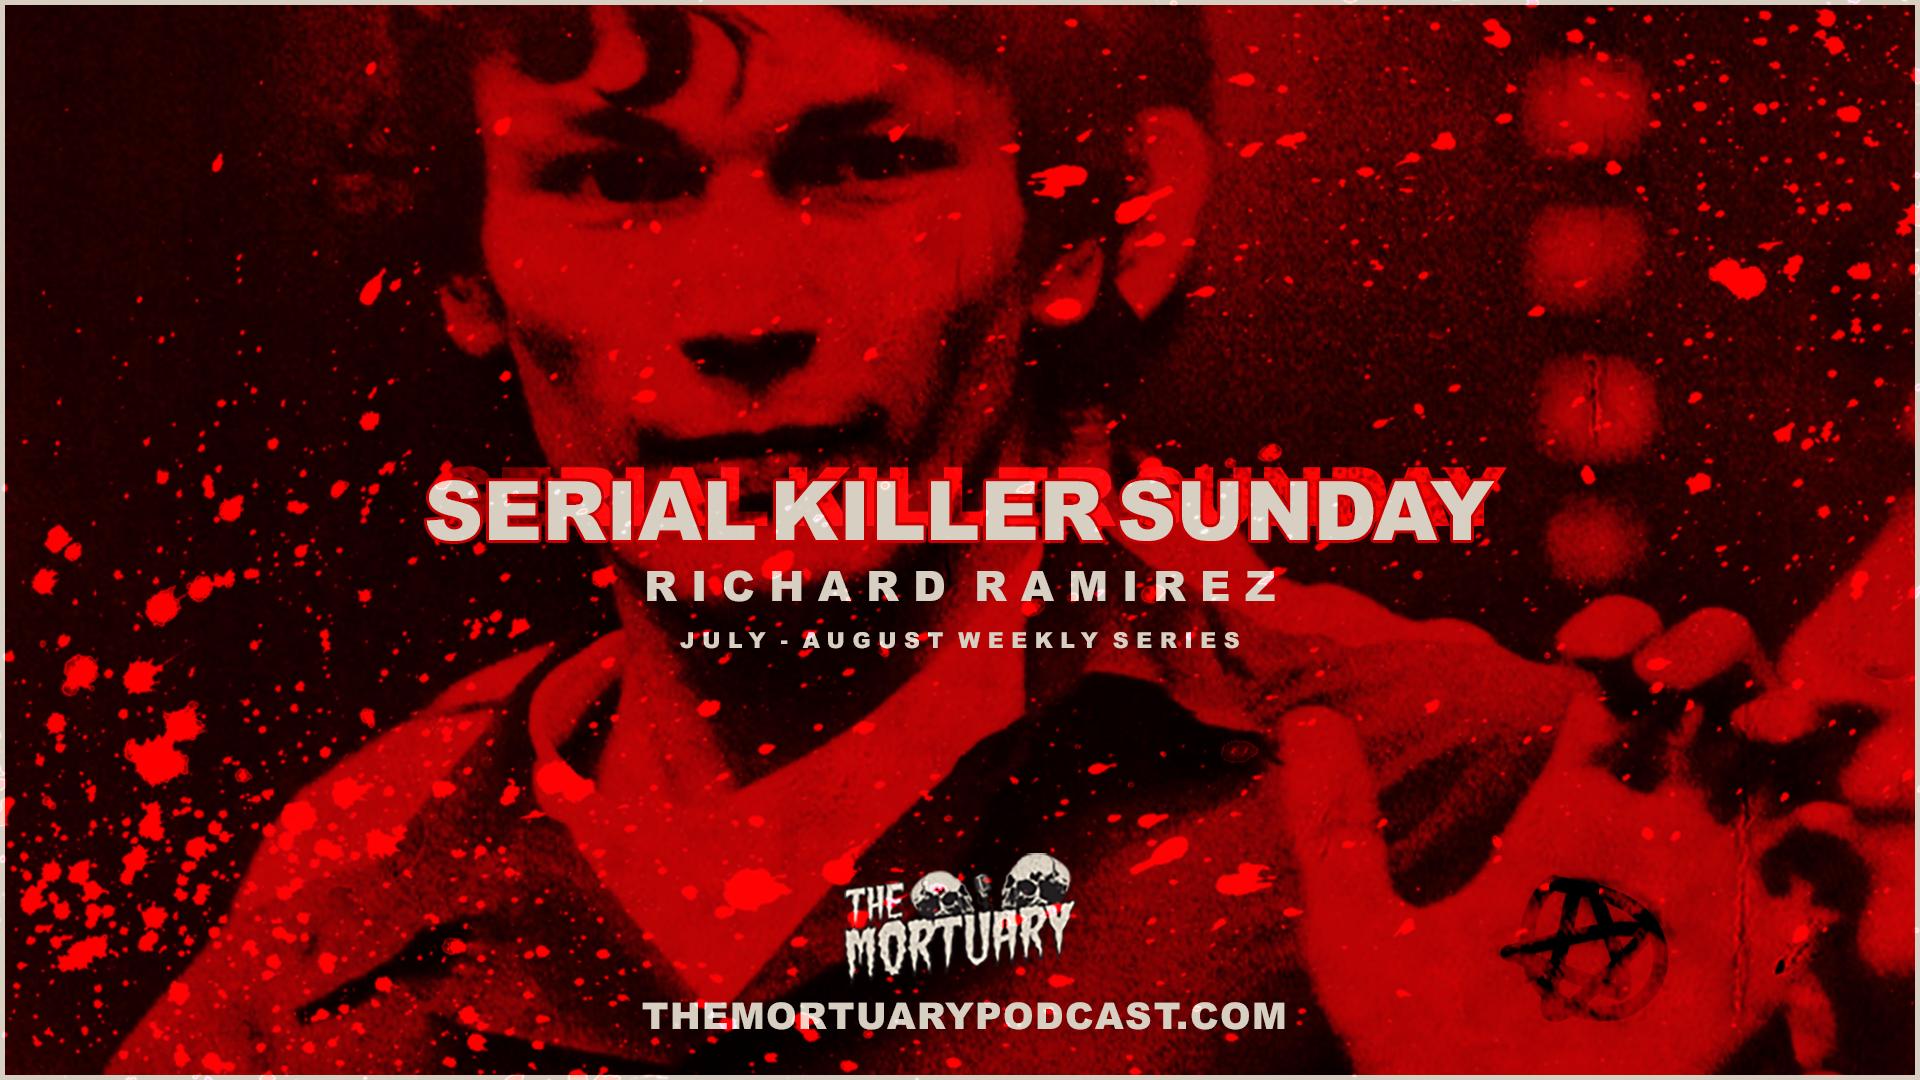 Richard Ramirez Serial Killer Sunday 2019 Thumb Template.png